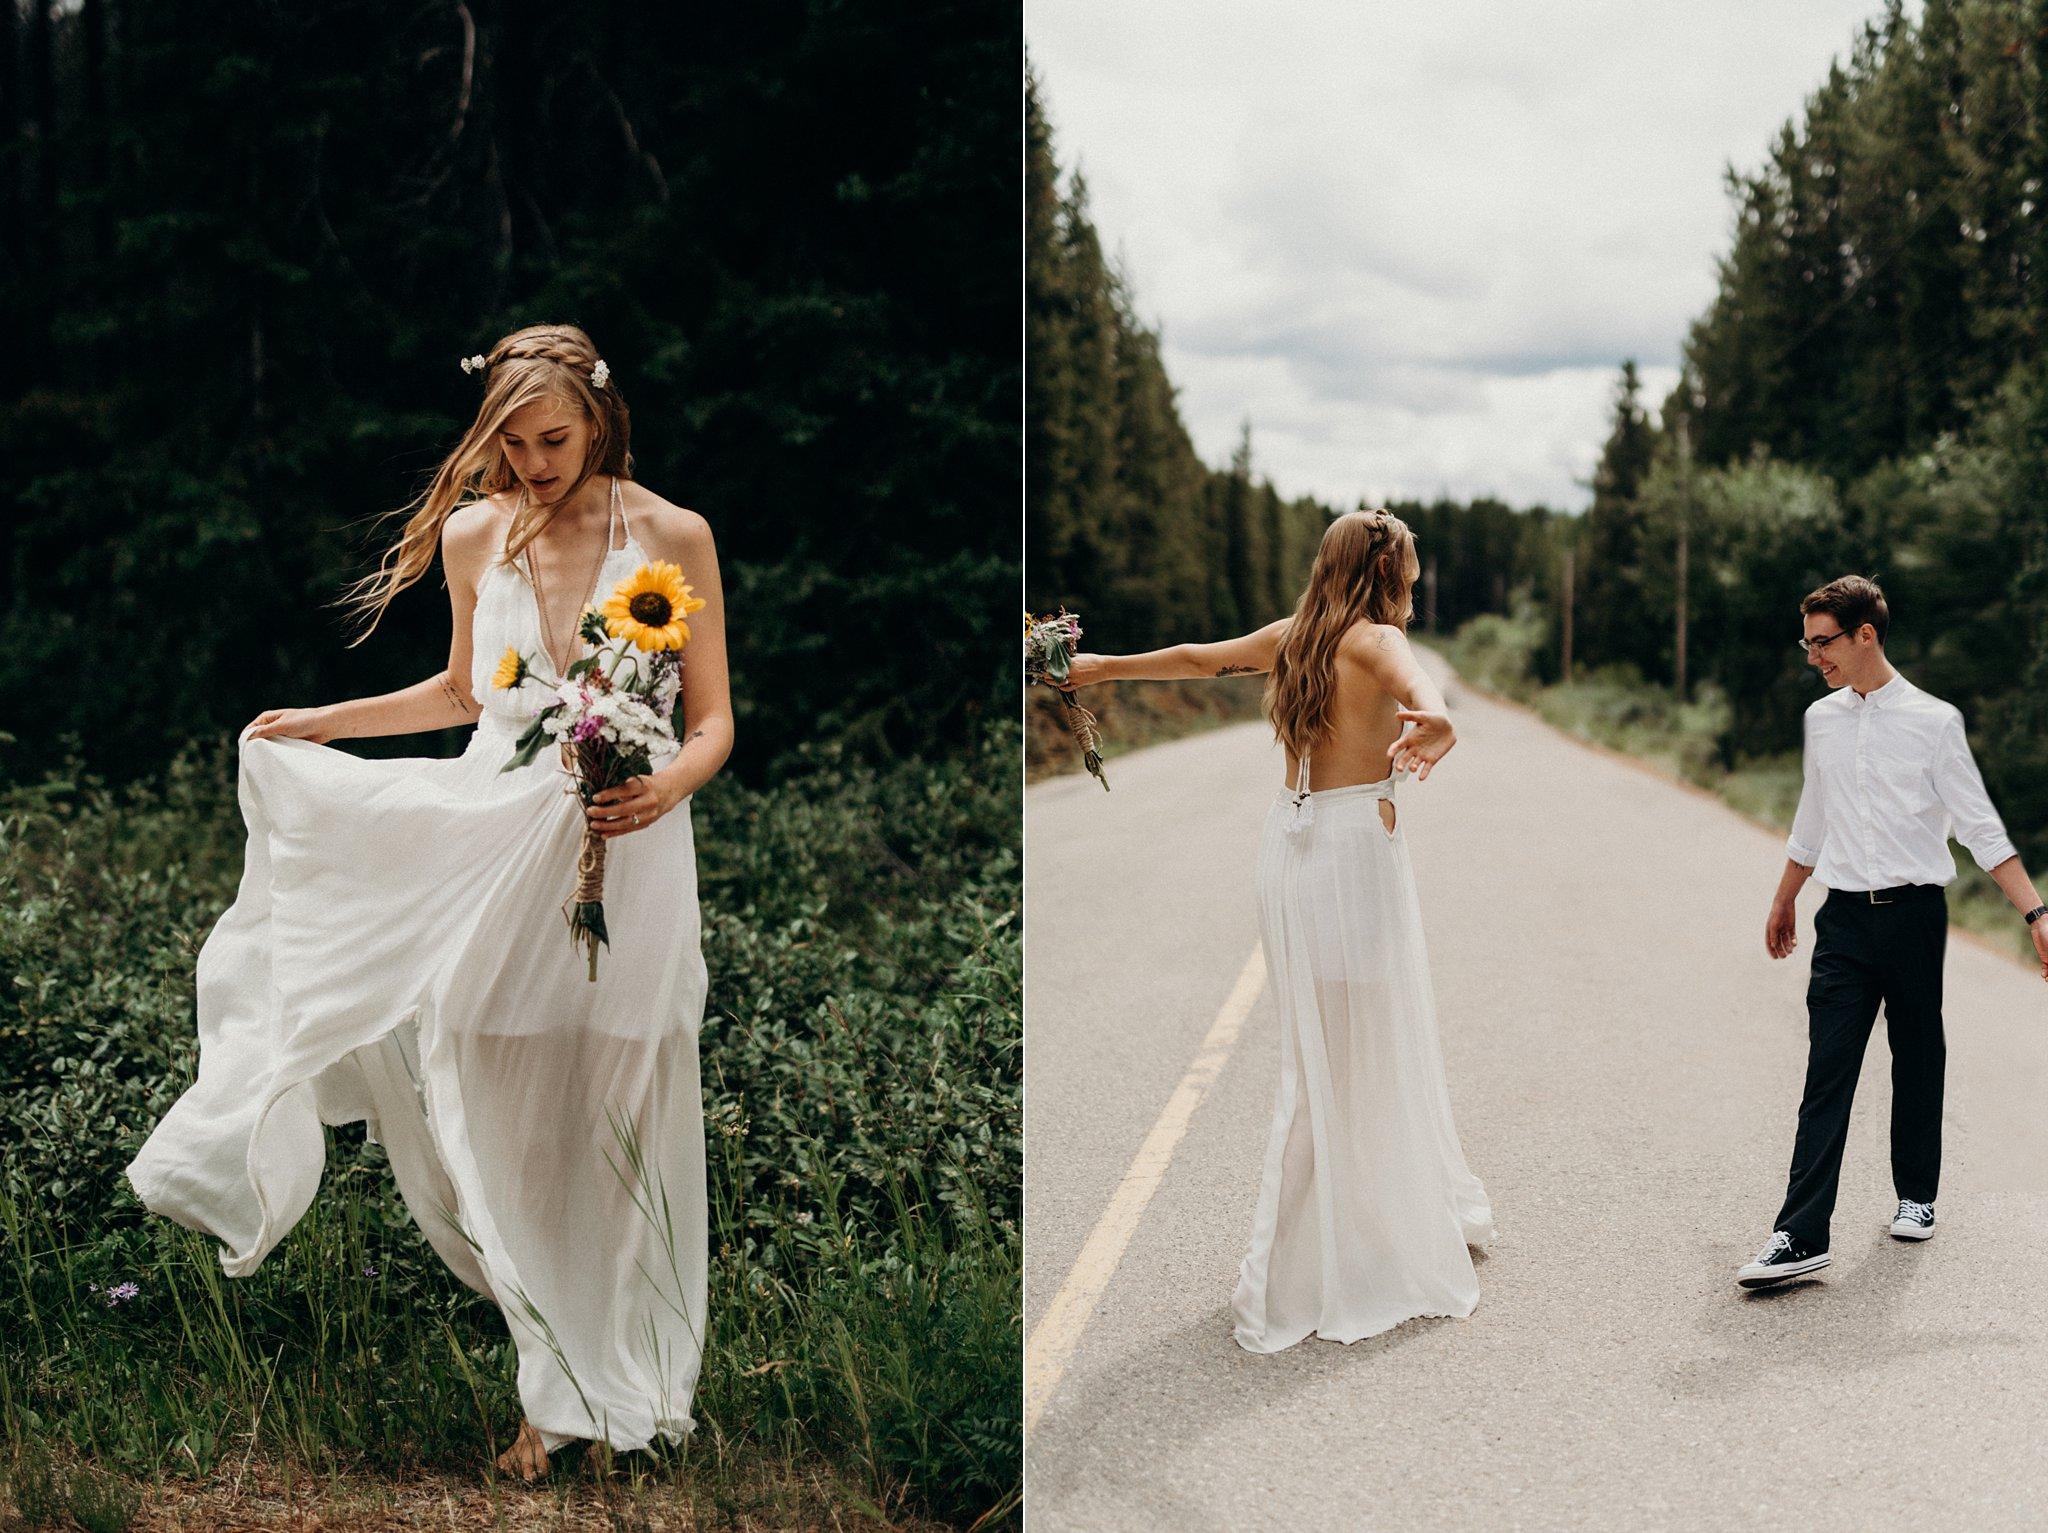 kaihla_tonai_intimate_wedding_elopement_photographer_6368.jpg